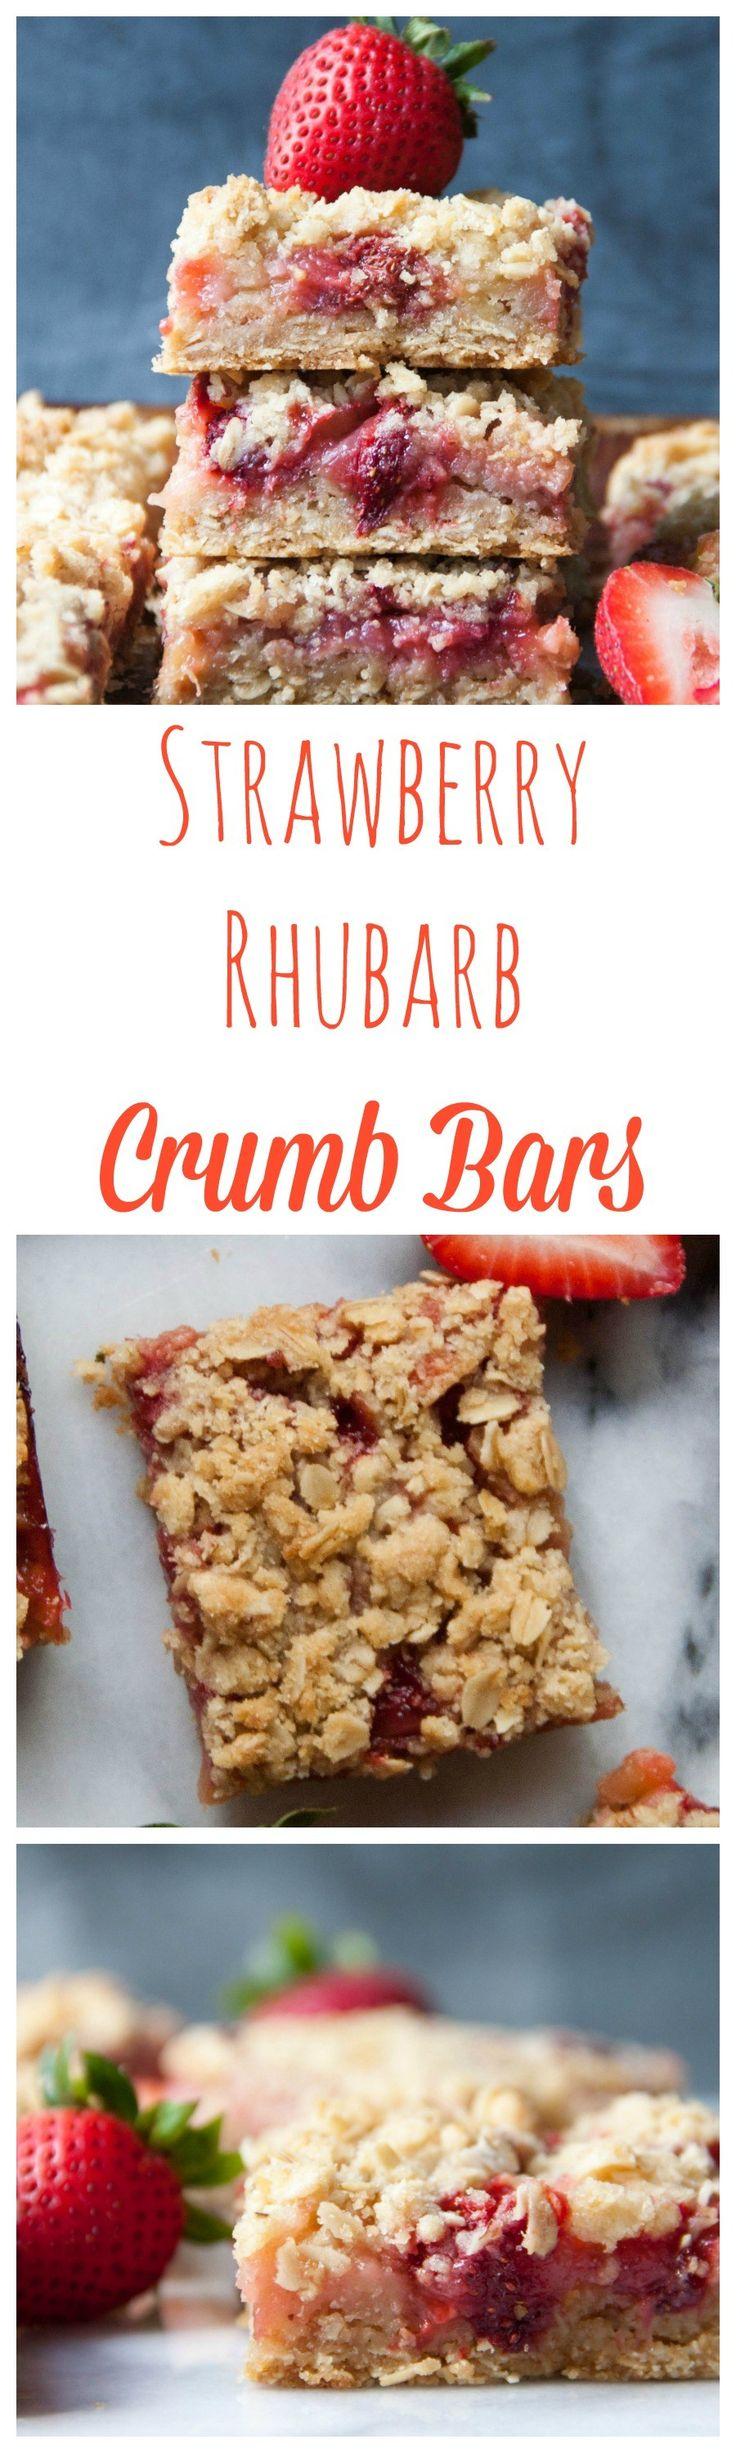 Strawberry Rhubarb Crumb Bars | strawberry rhubarb bars | strawberry bars | strawberry recipes | rhubarb recipes | crumb bars